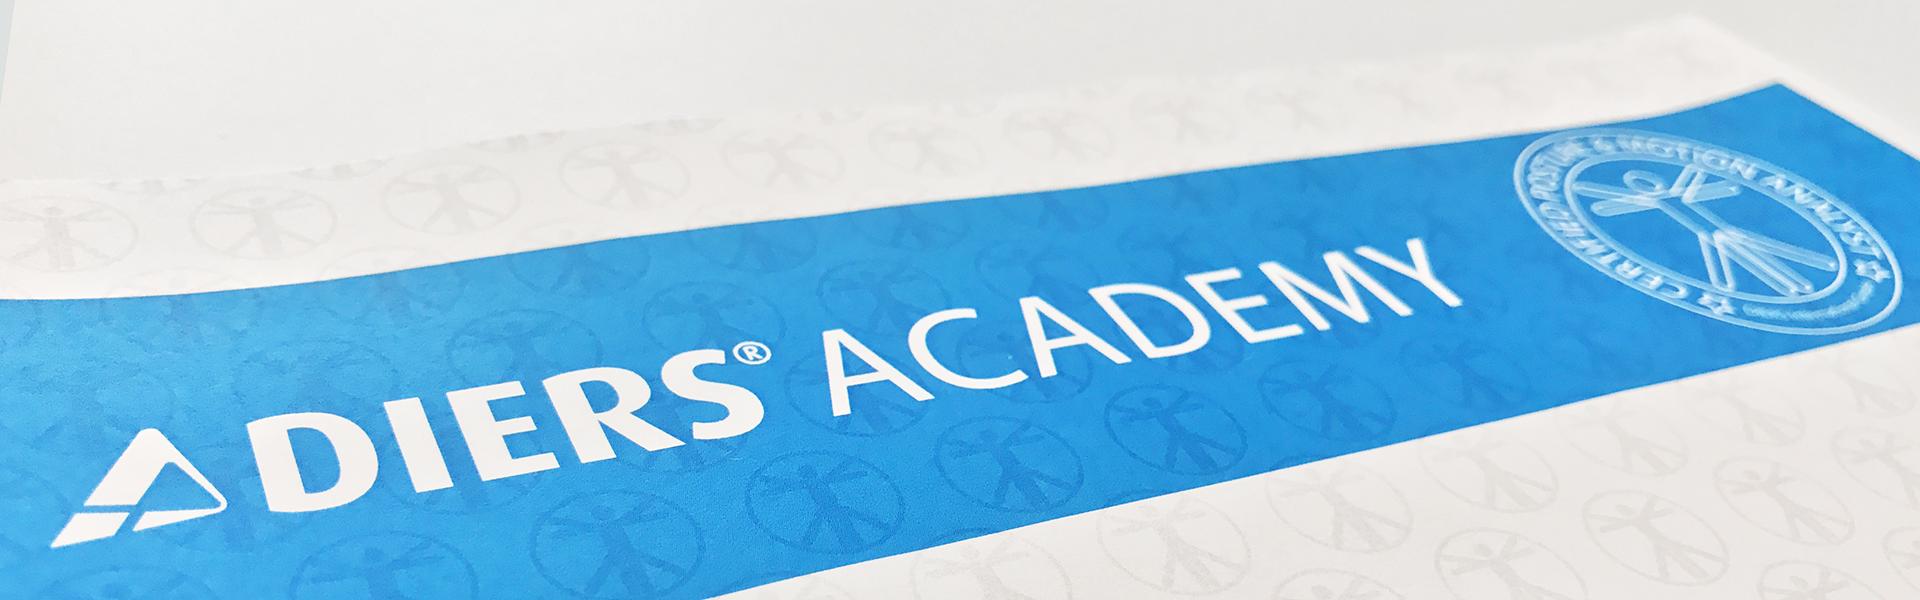 Slider_Academy_Certification_1920x600px